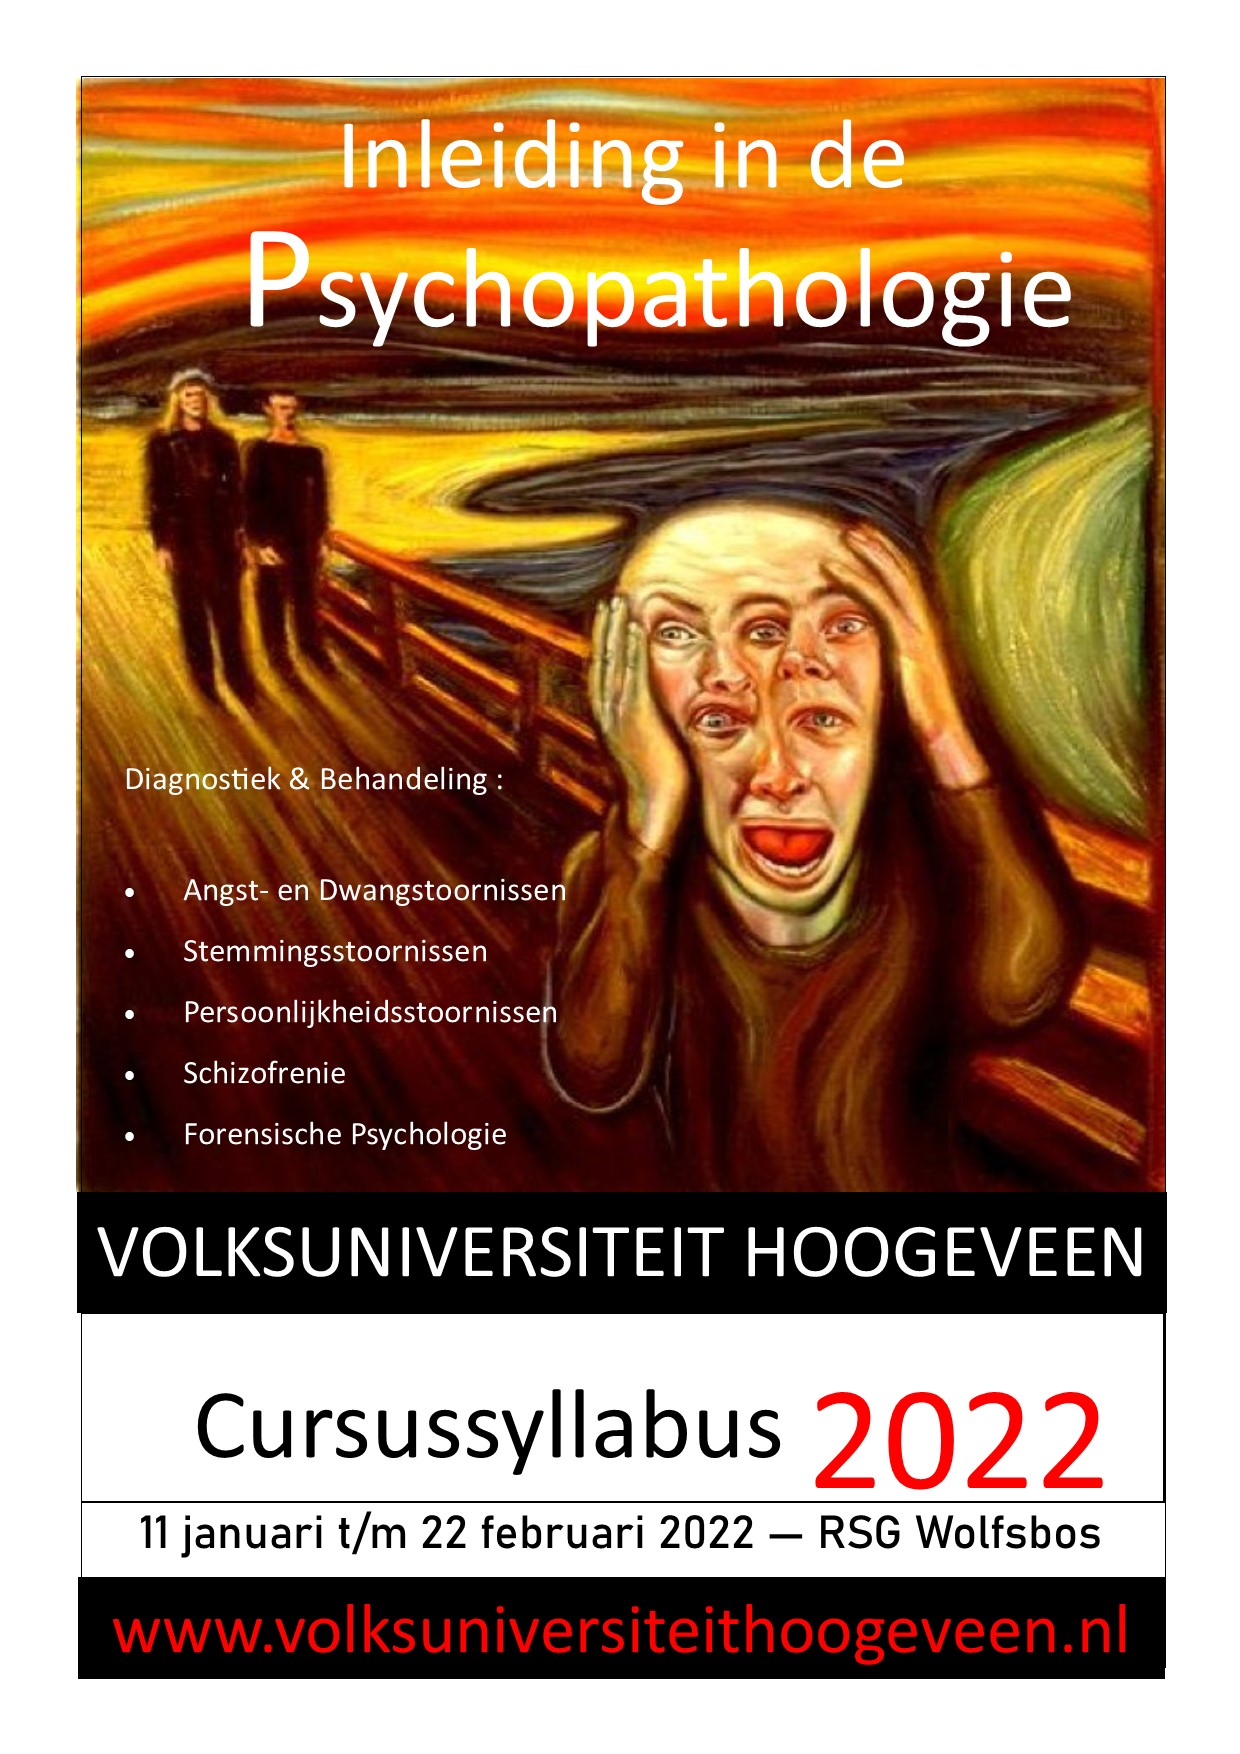 Cursus Psychologie - Inleiding in de Psychopathologie